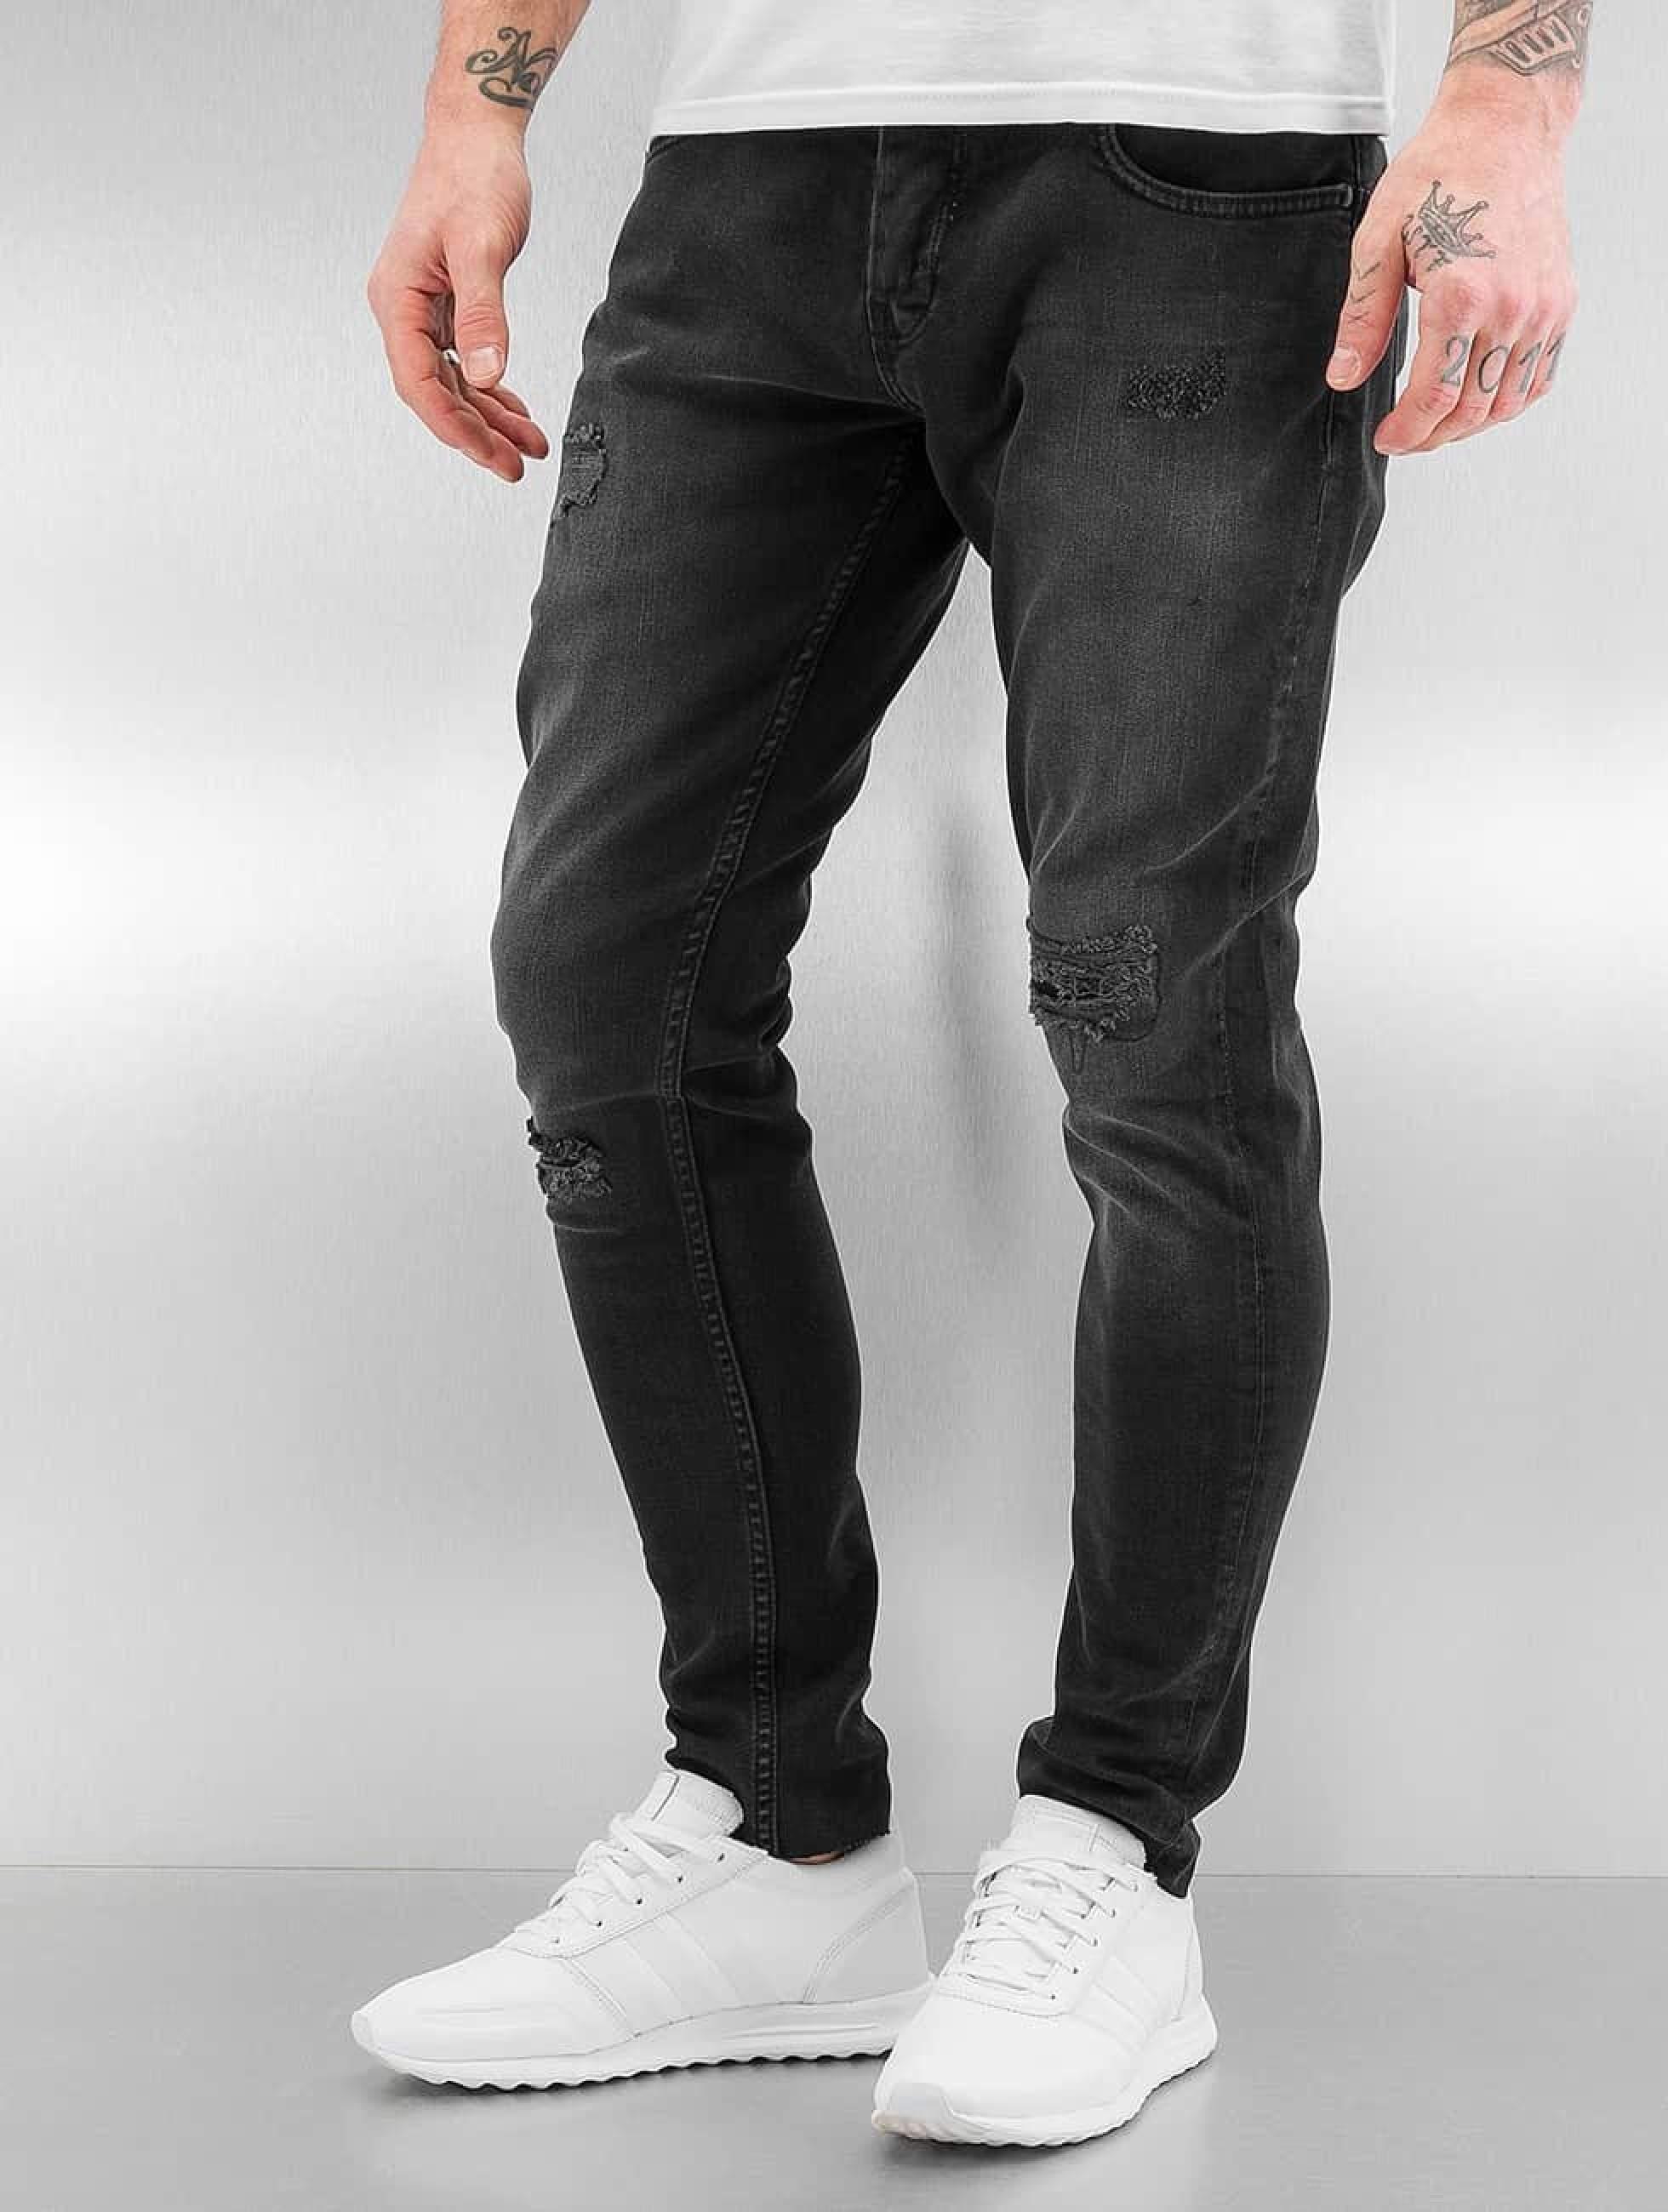 Bangastic / Slim Fit Jeans A75 in black W 33